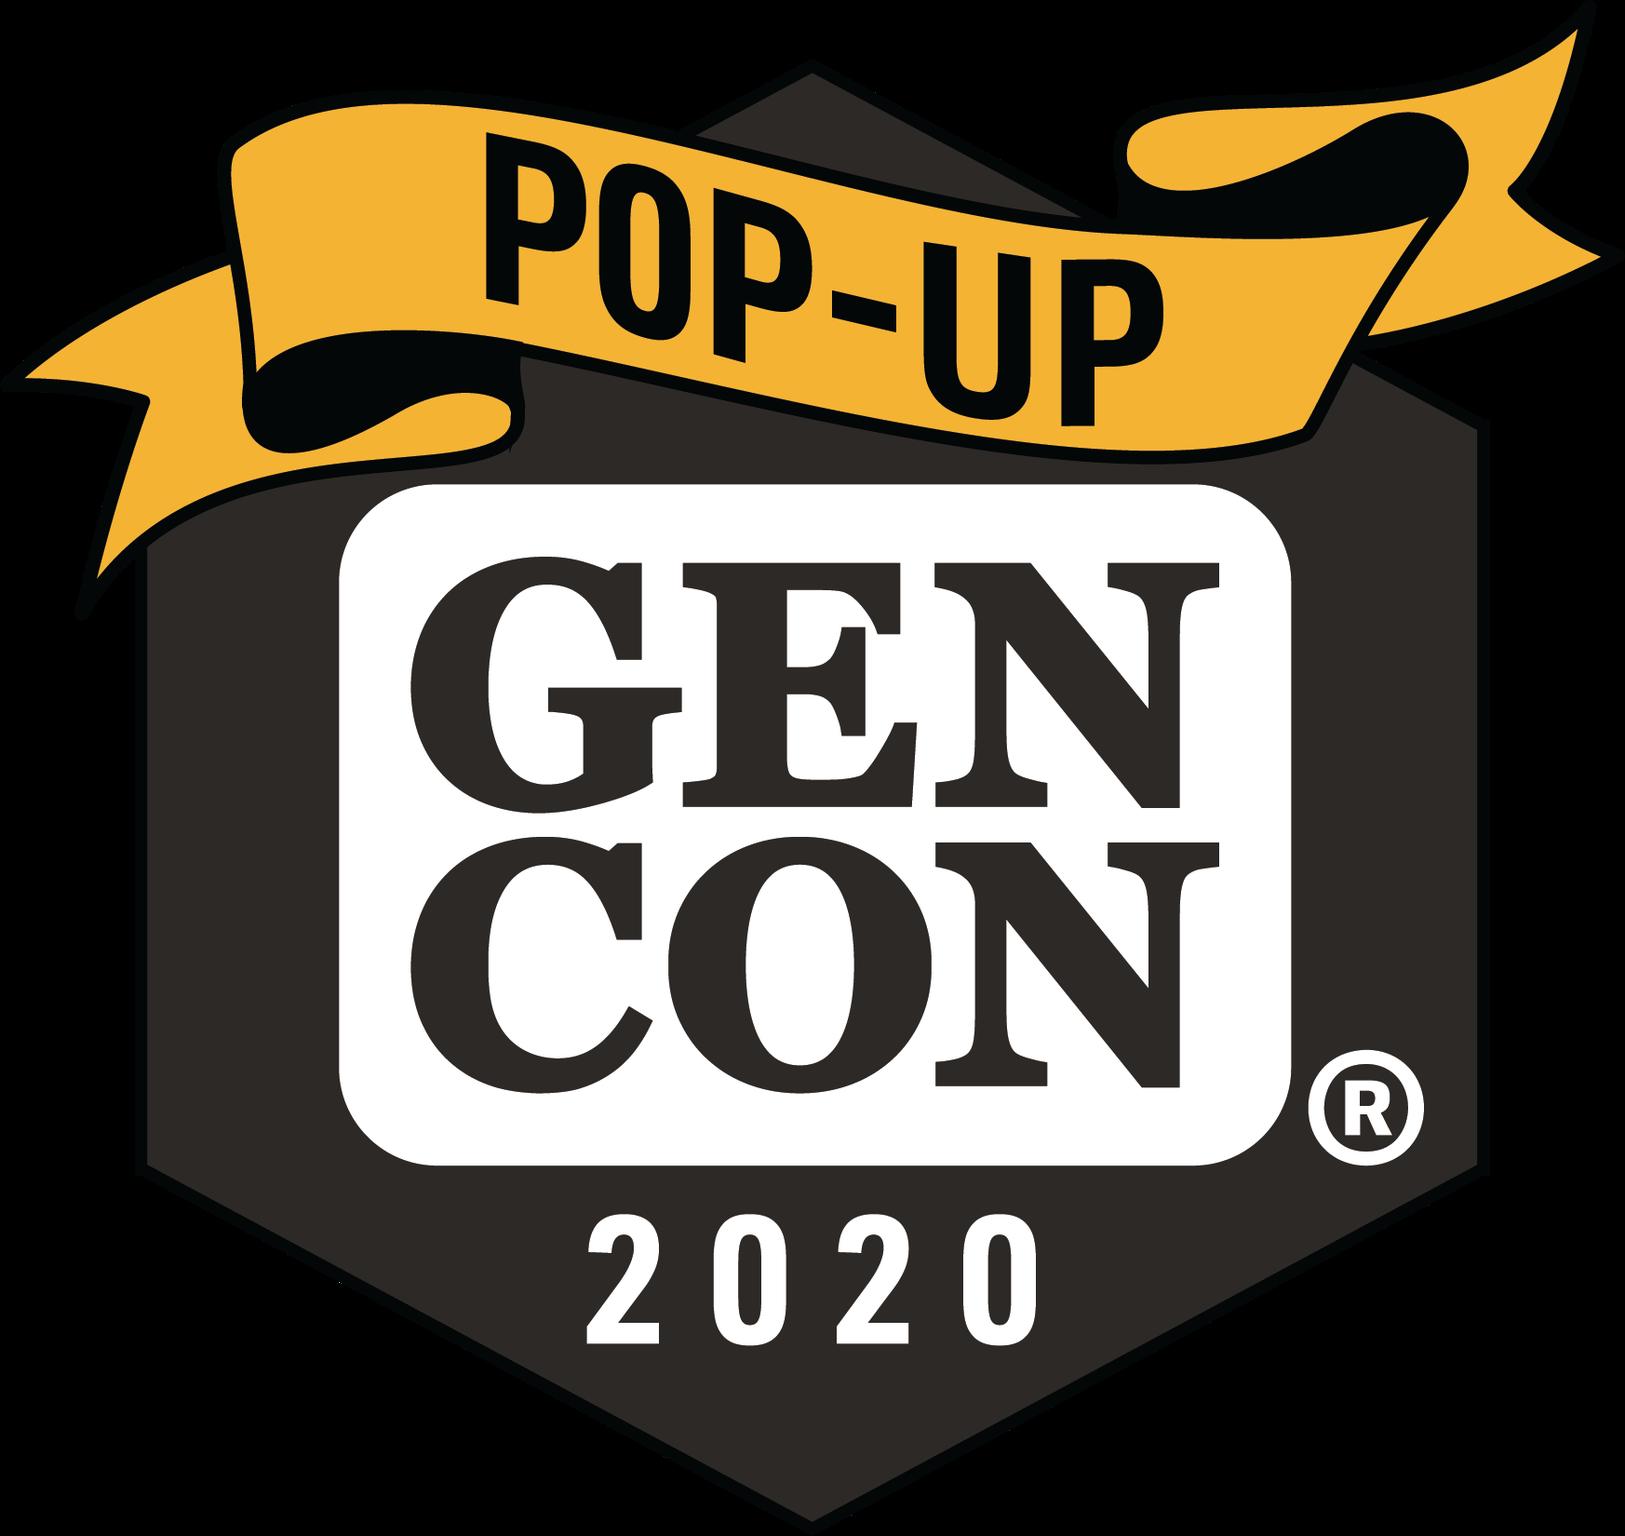 Pop-Up Gen Con Logo